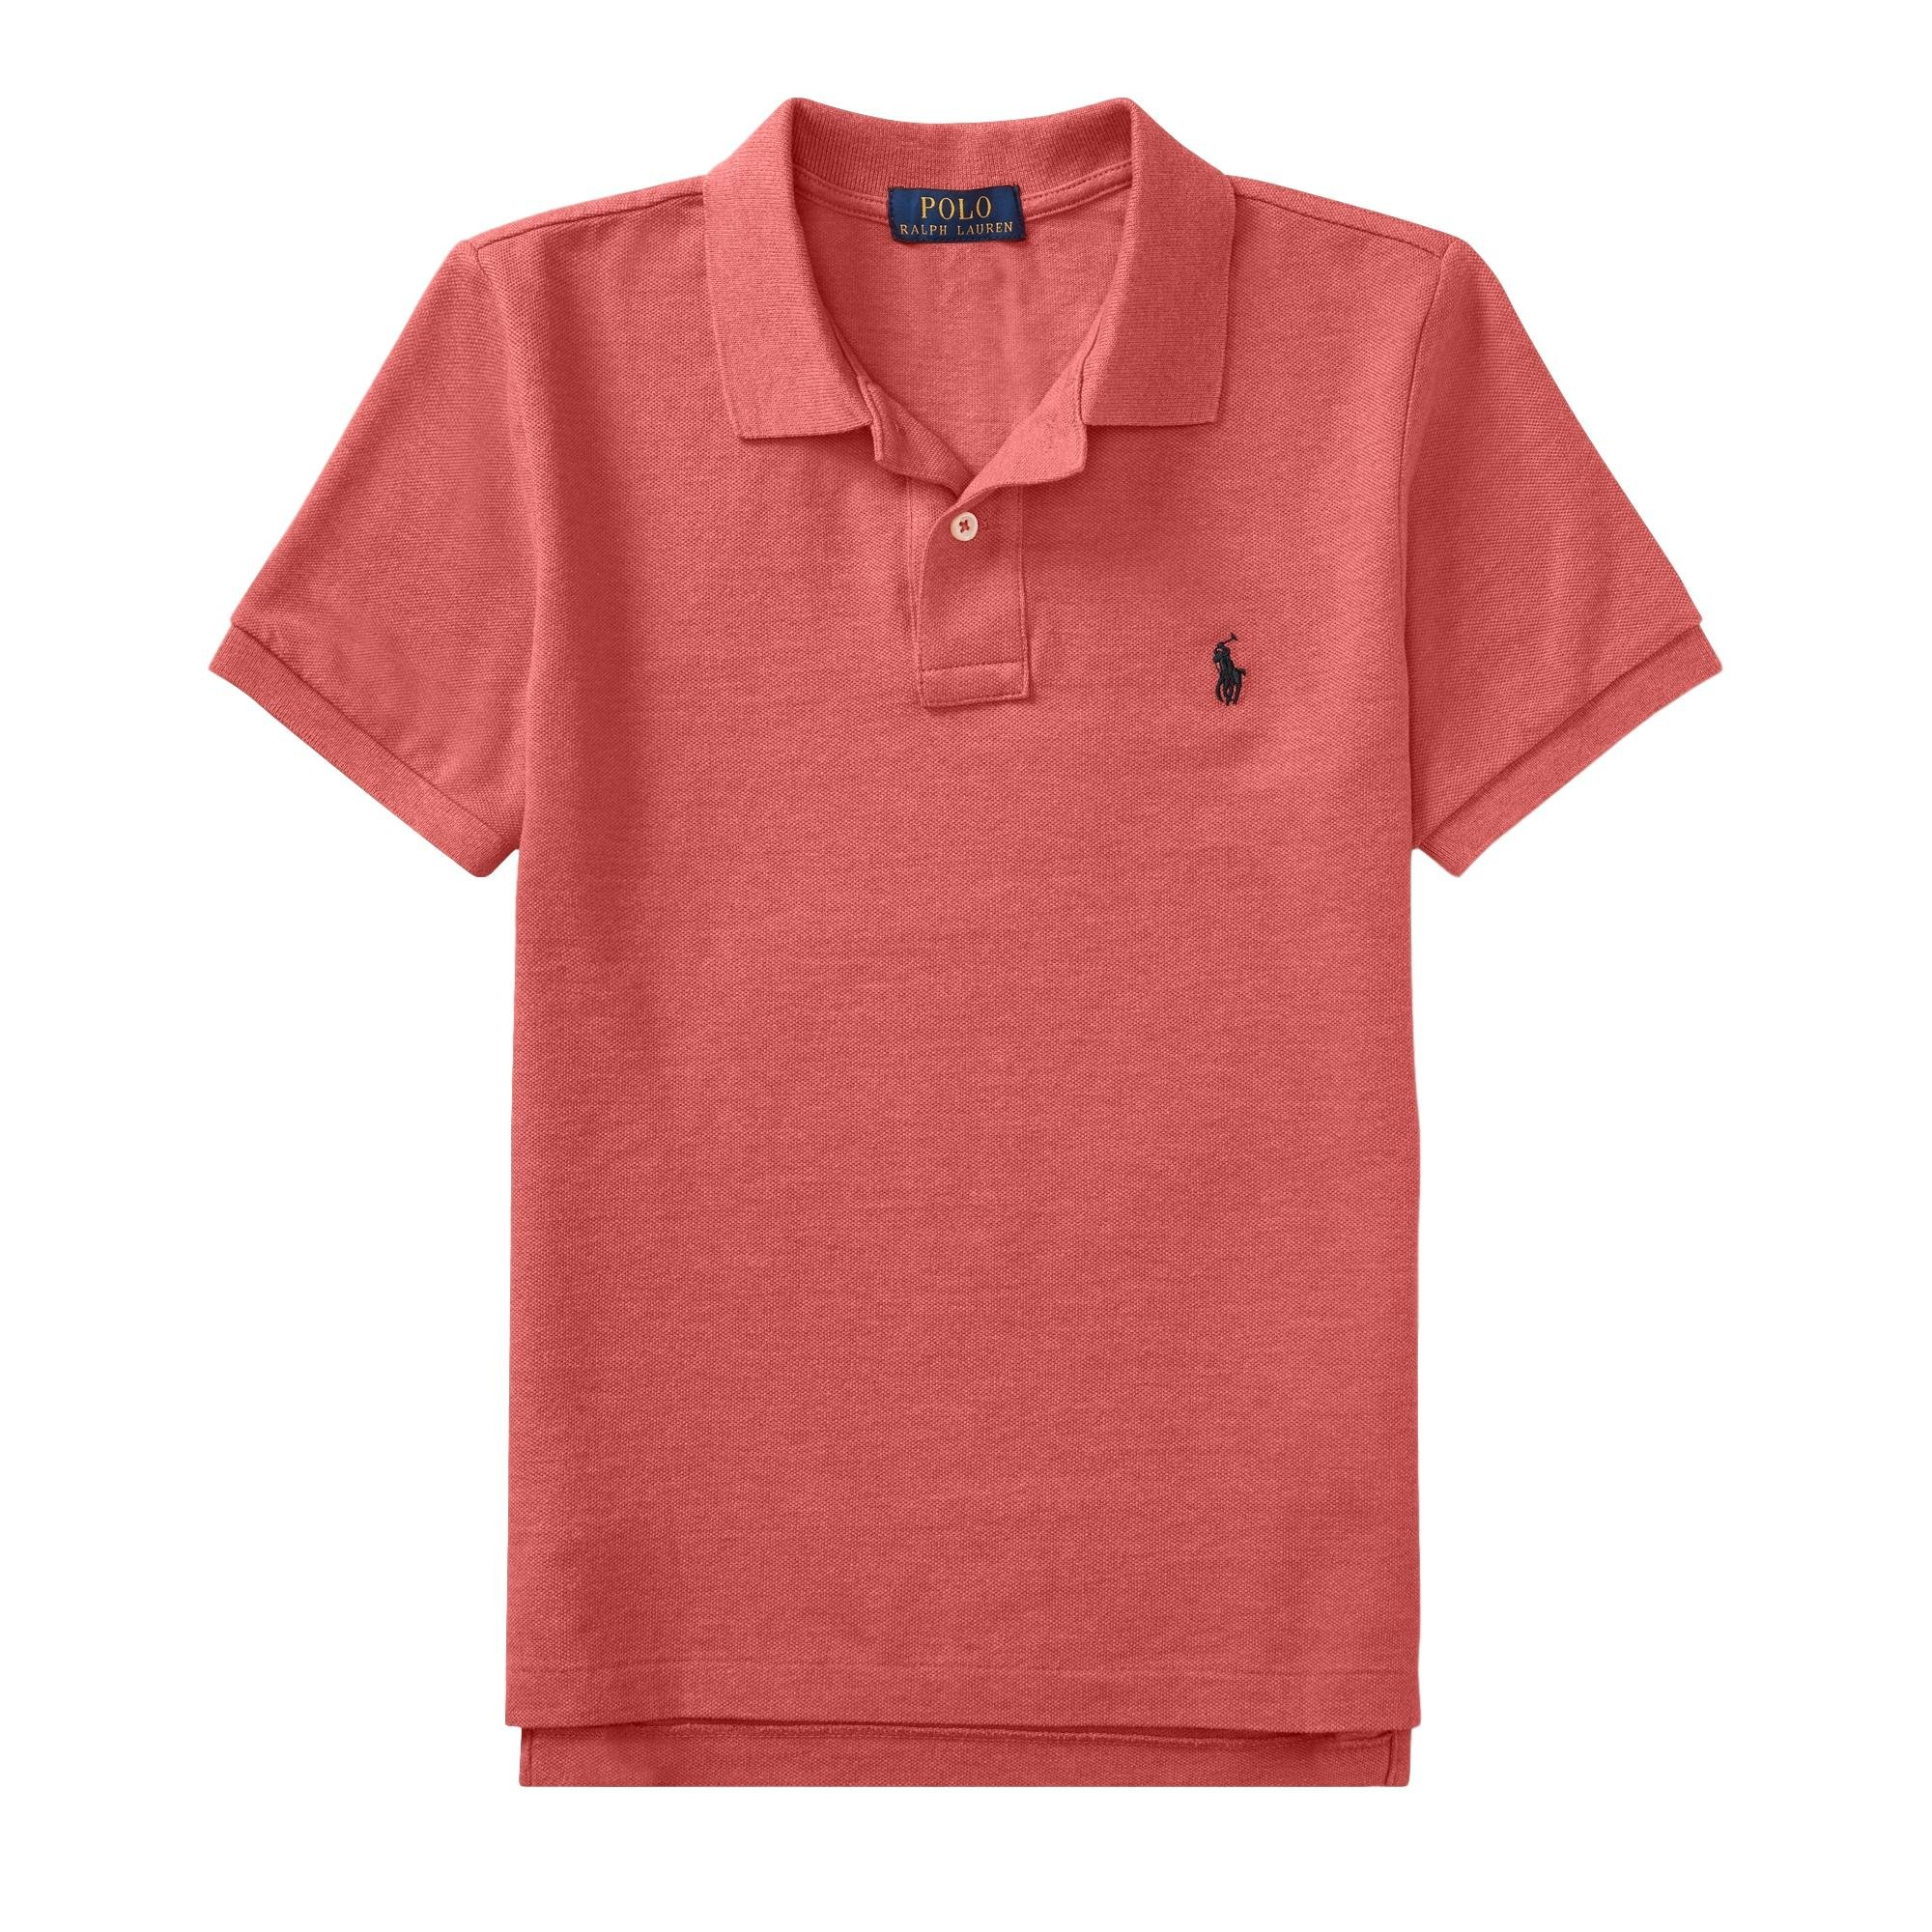 Ralph Lauren Polo Boys' Classic Cotton Mesh Polo Shirt (SalmonHth, S) by Polo Ralph Lauren (Image #1)